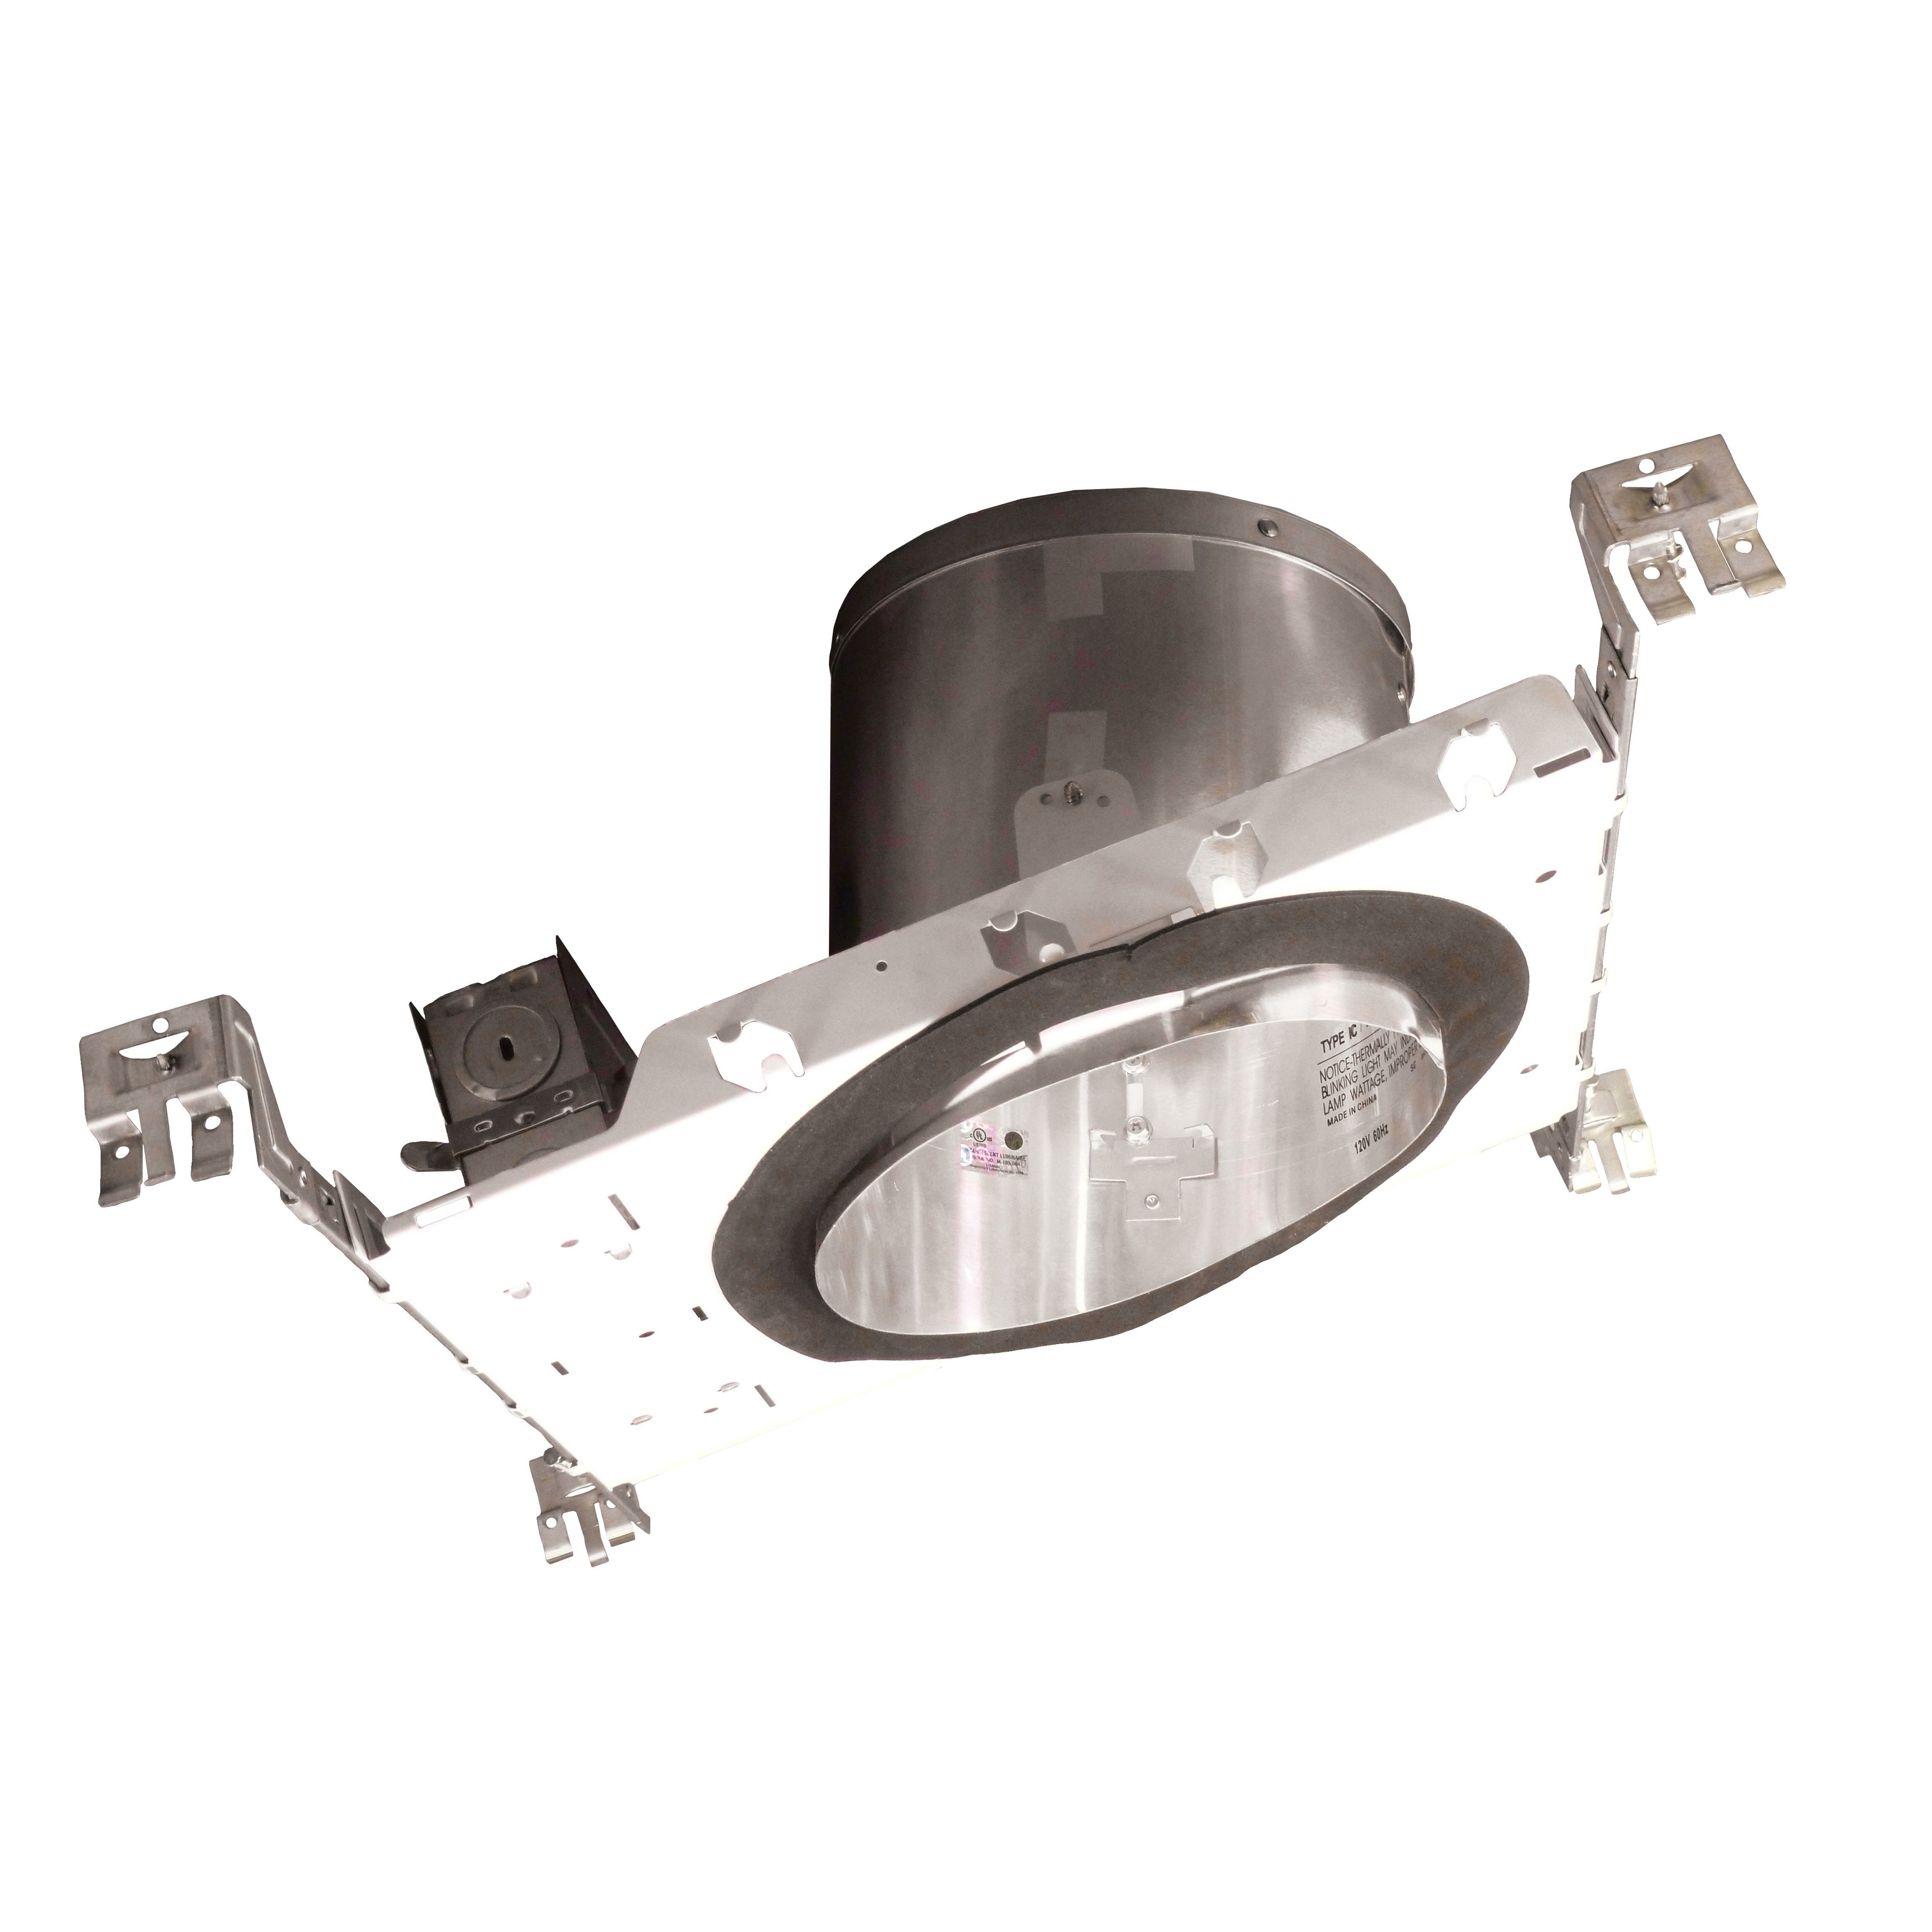 lighting ceiling lights all recessed lighting nicor lighting sku. Black Bedroom Furniture Sets. Home Design Ideas